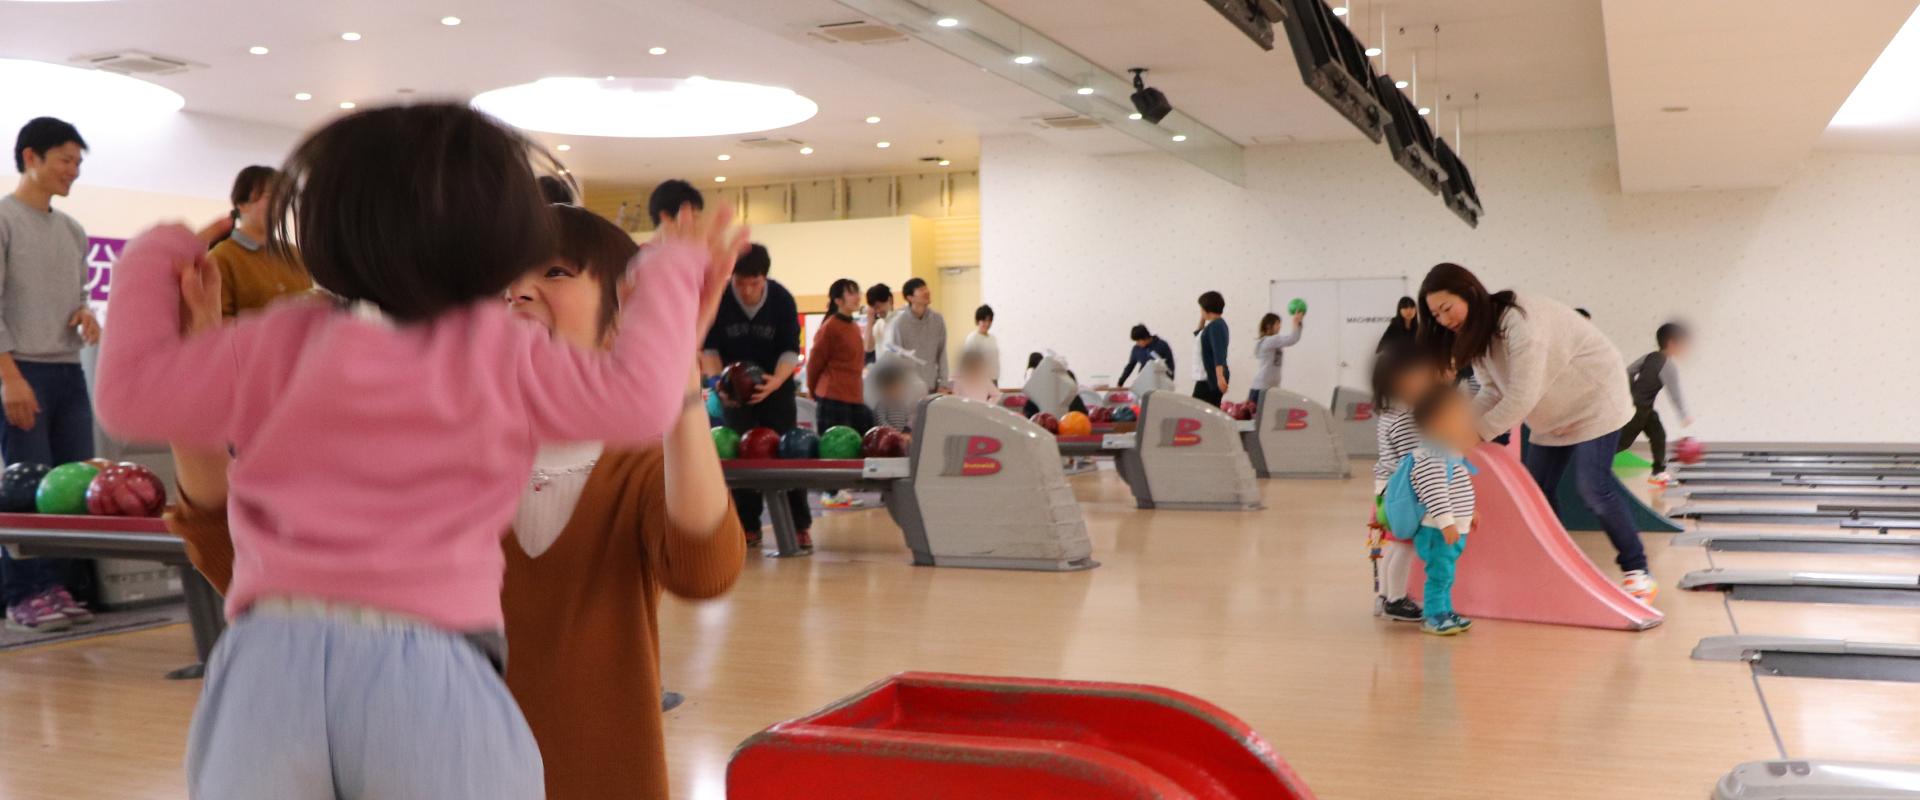 宇野病院 採用情報 福利厚生 ボーリング大会